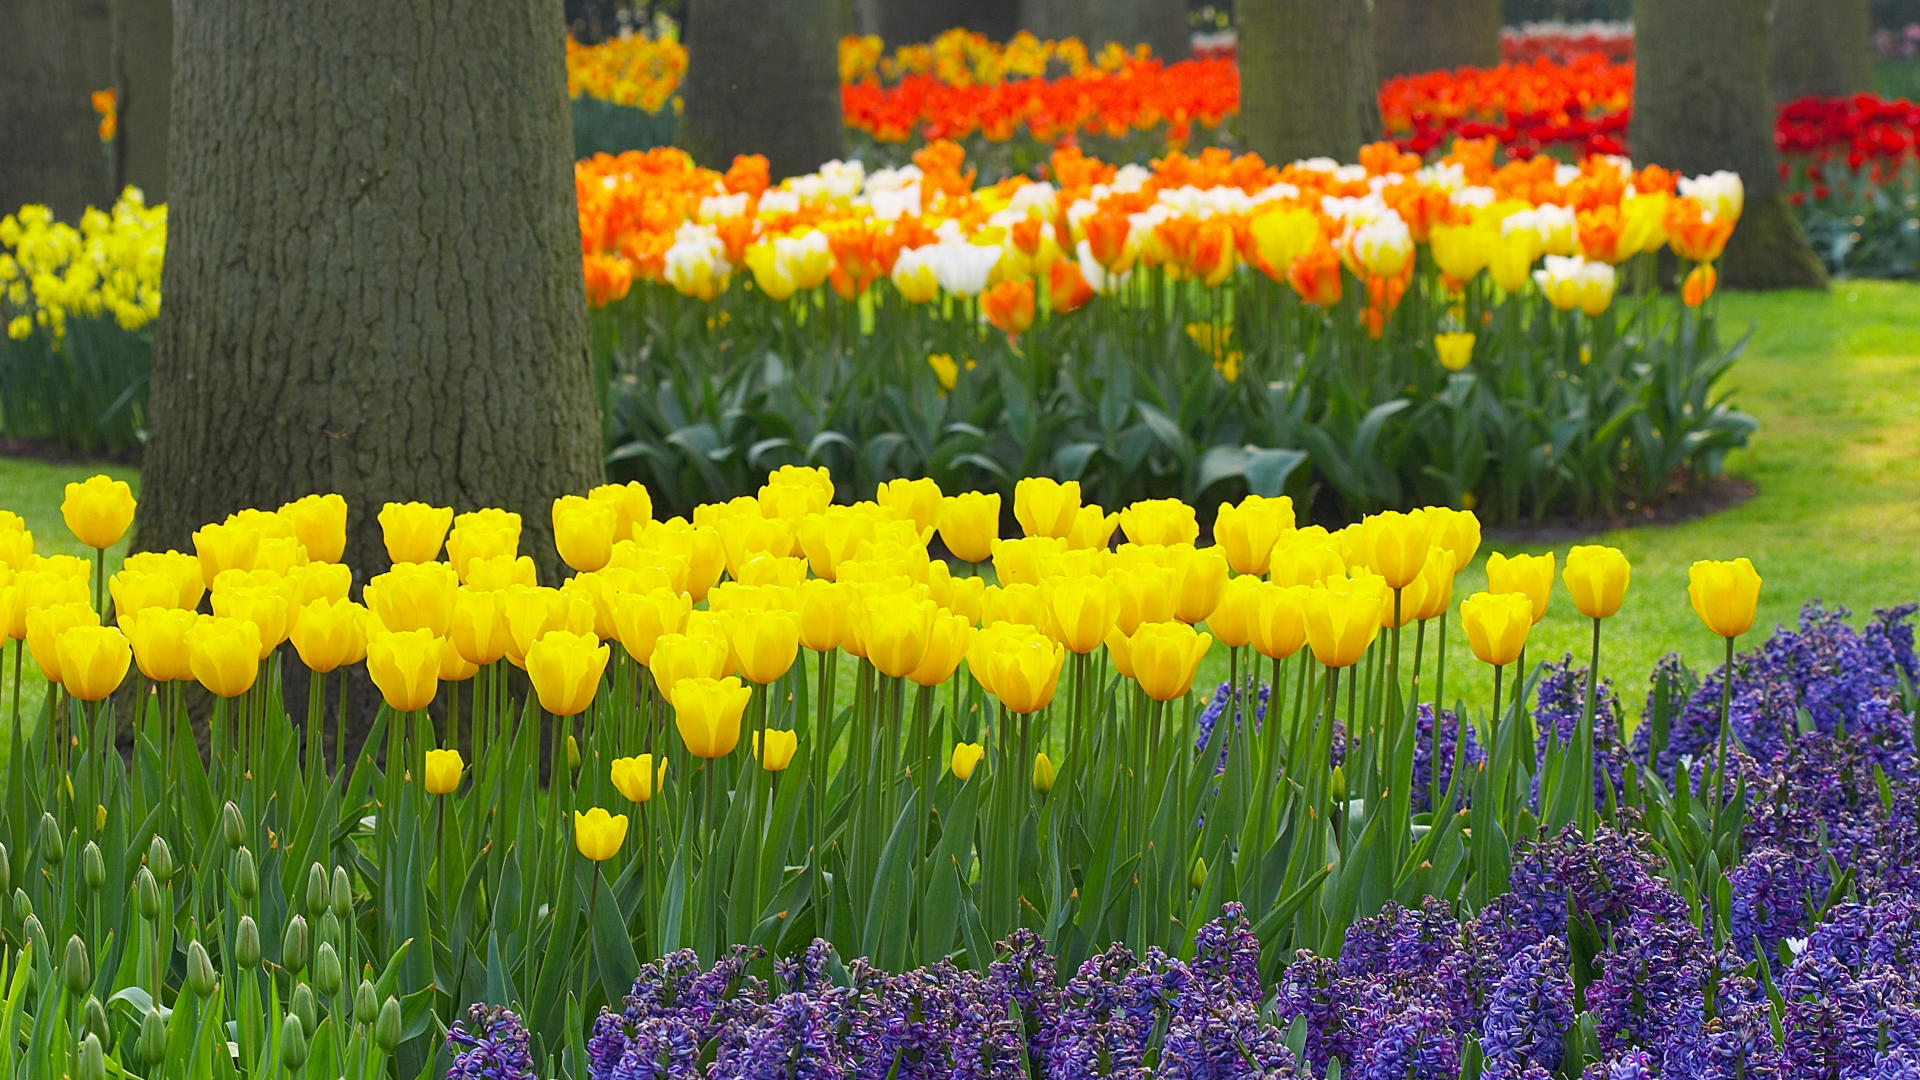 Flower garden wallpaper background - Download Background Spring Garden Keukenhof Gardens Lisse Holland